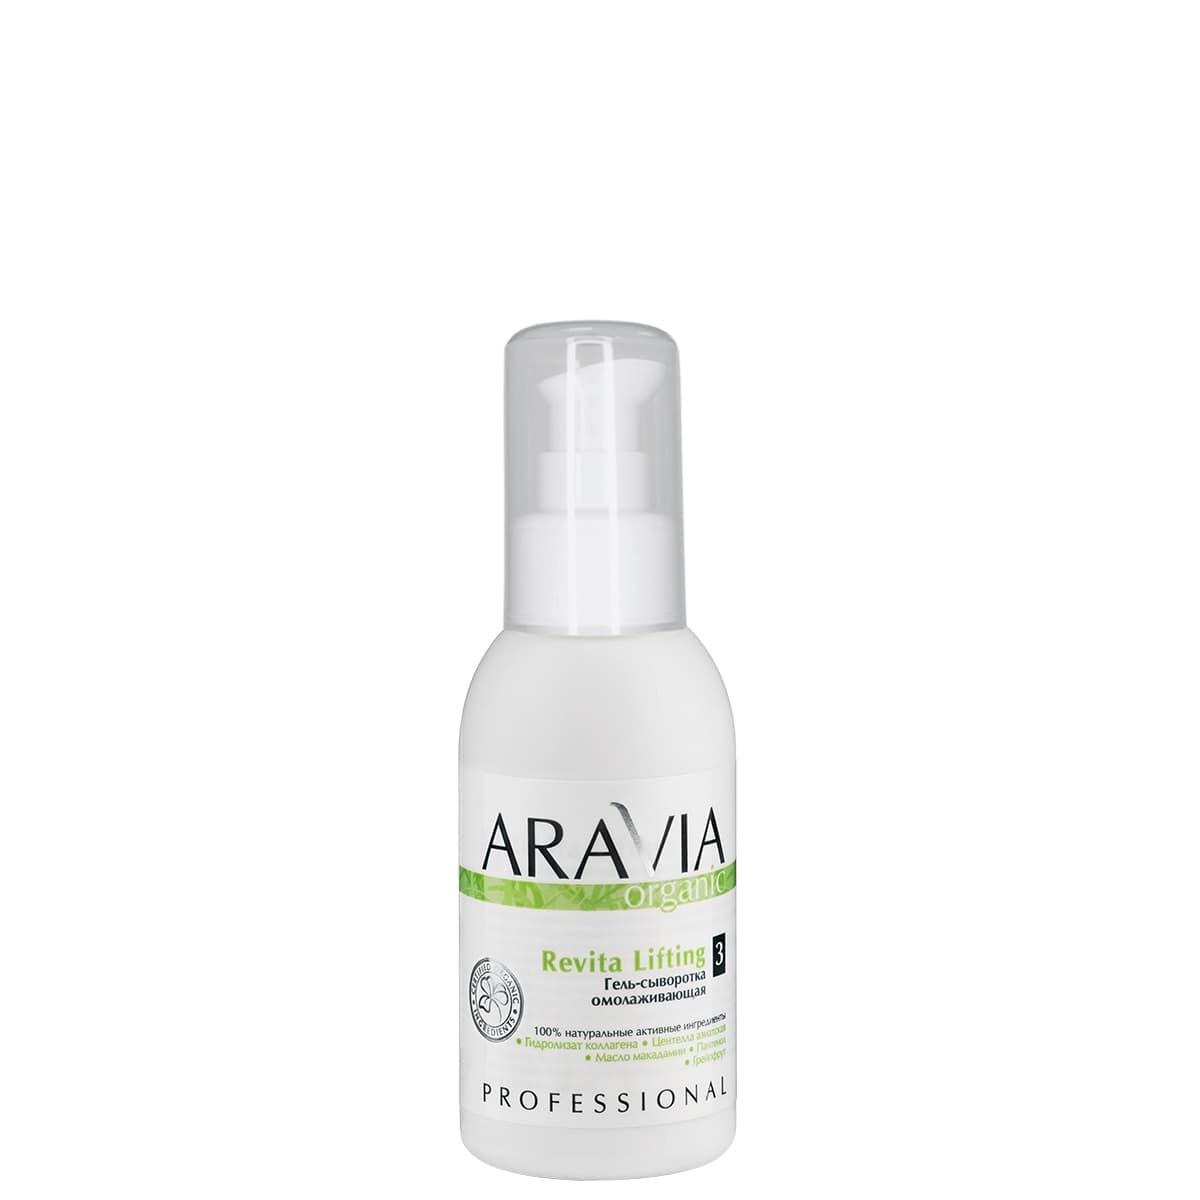 ARAVIA Organic Гель-Сыворотка Омолаживающая «Revita Lifting», 100 мл